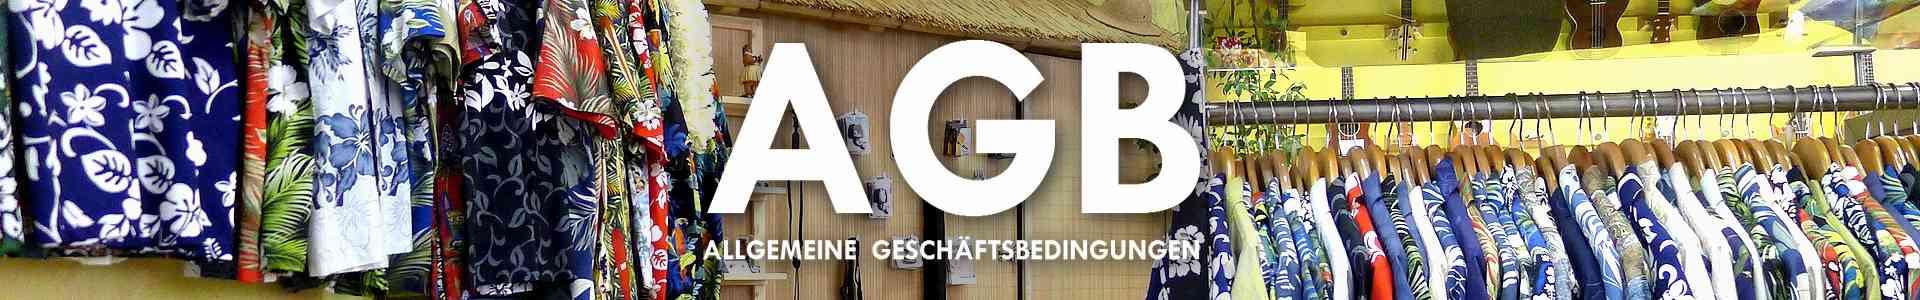 Ukulele Fieber Company - AGB